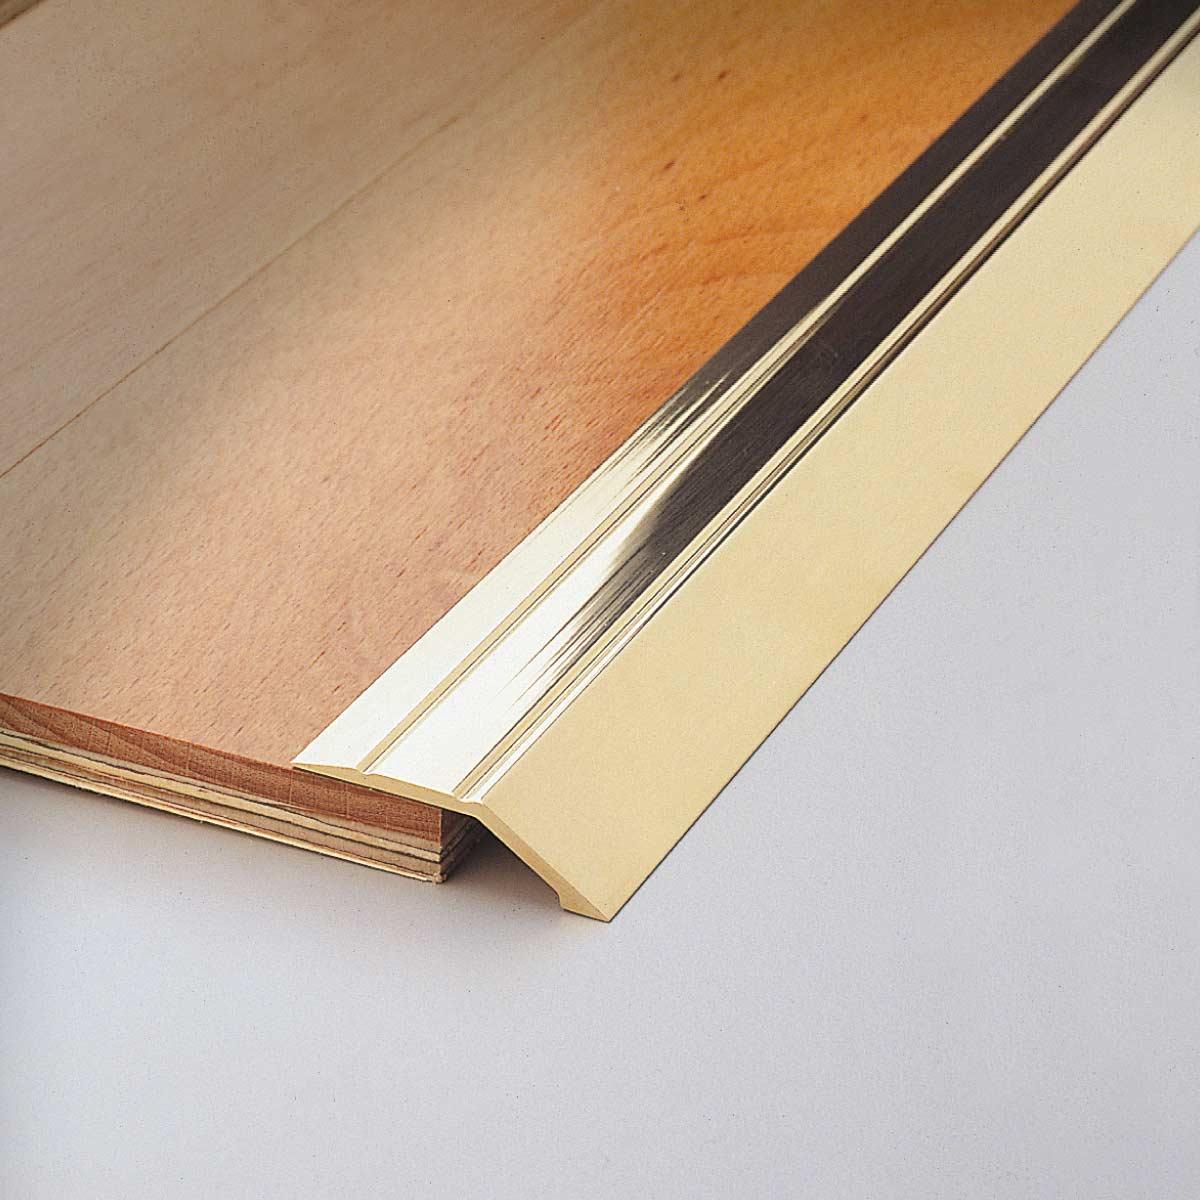 Profili per pavimenti Leveltec RP 80 OL Profilitec